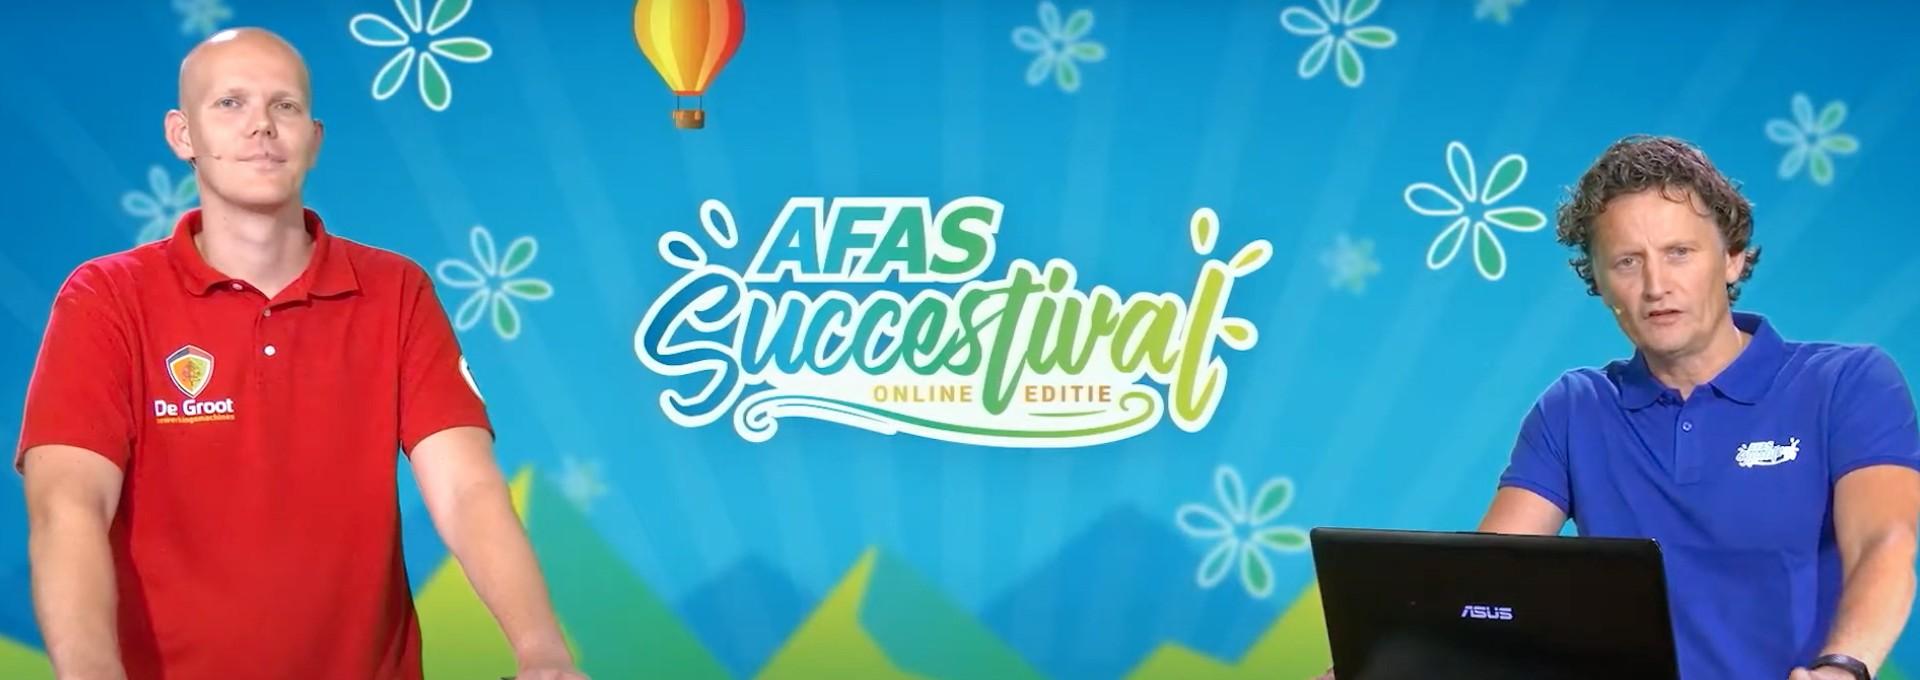 Relyon tijdens AFAS Succestival